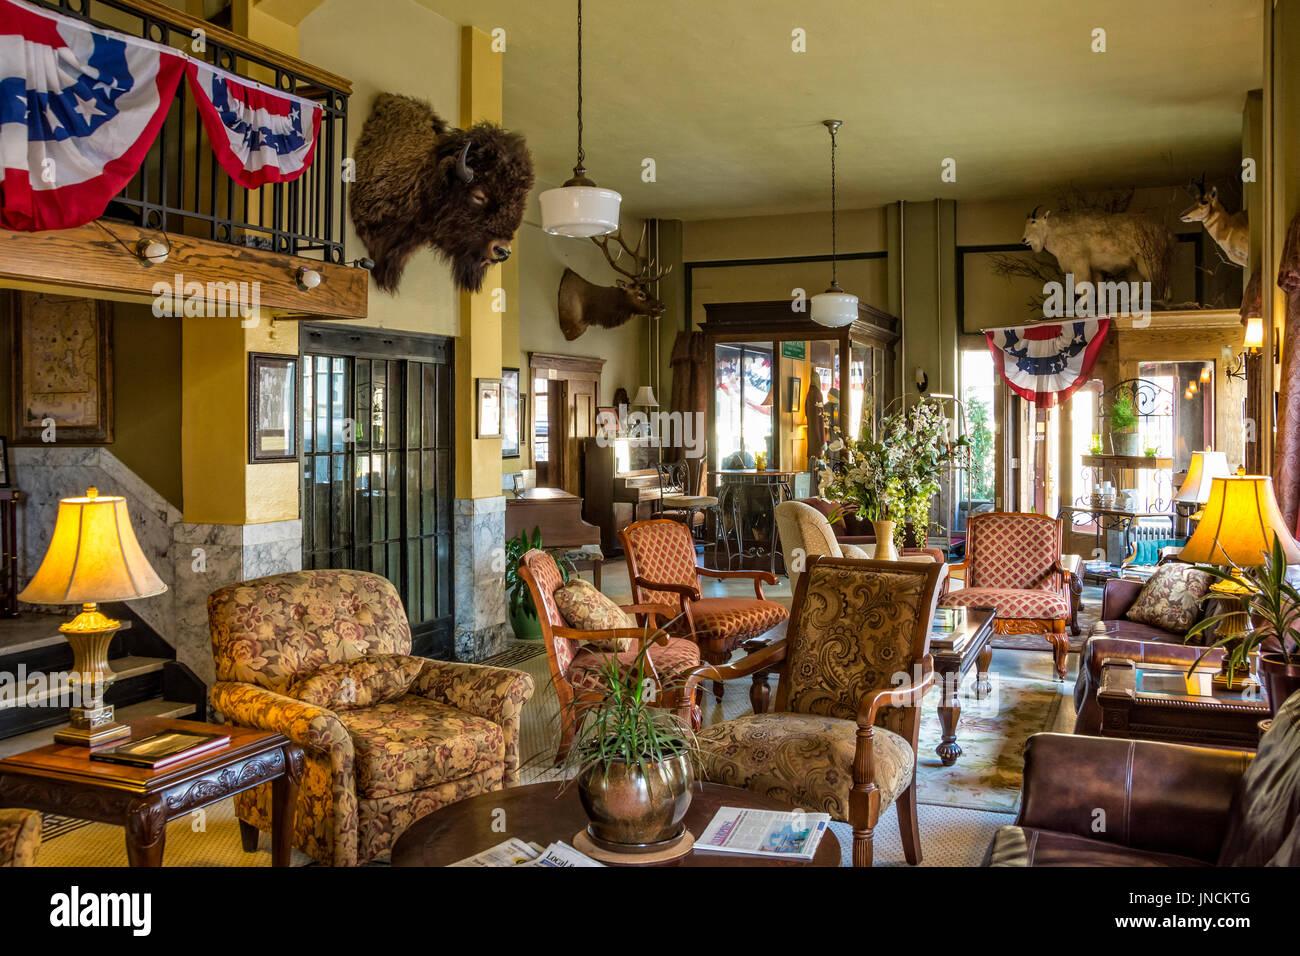 Lobby of the historic Murray Hotel in Livingston, Montana. - Stock Image